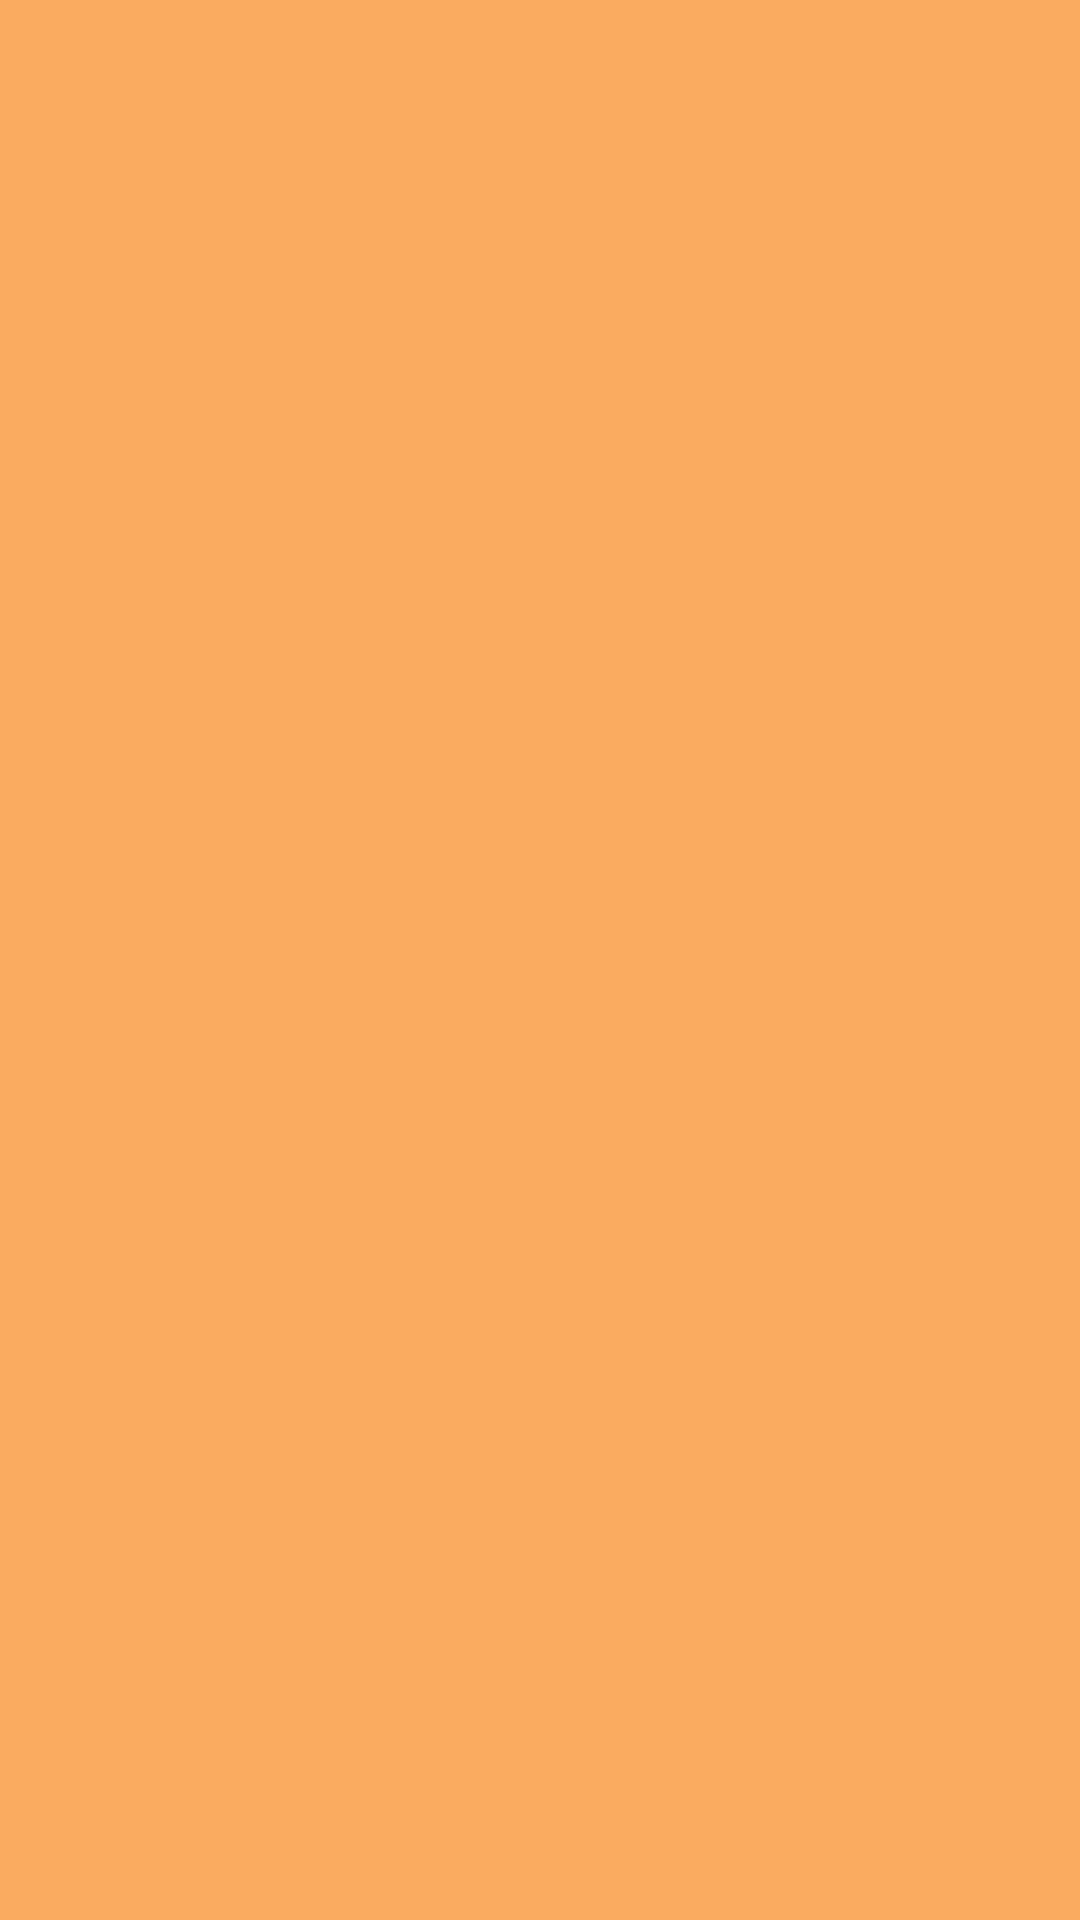 1080x1920 Rajah Solid Color Background